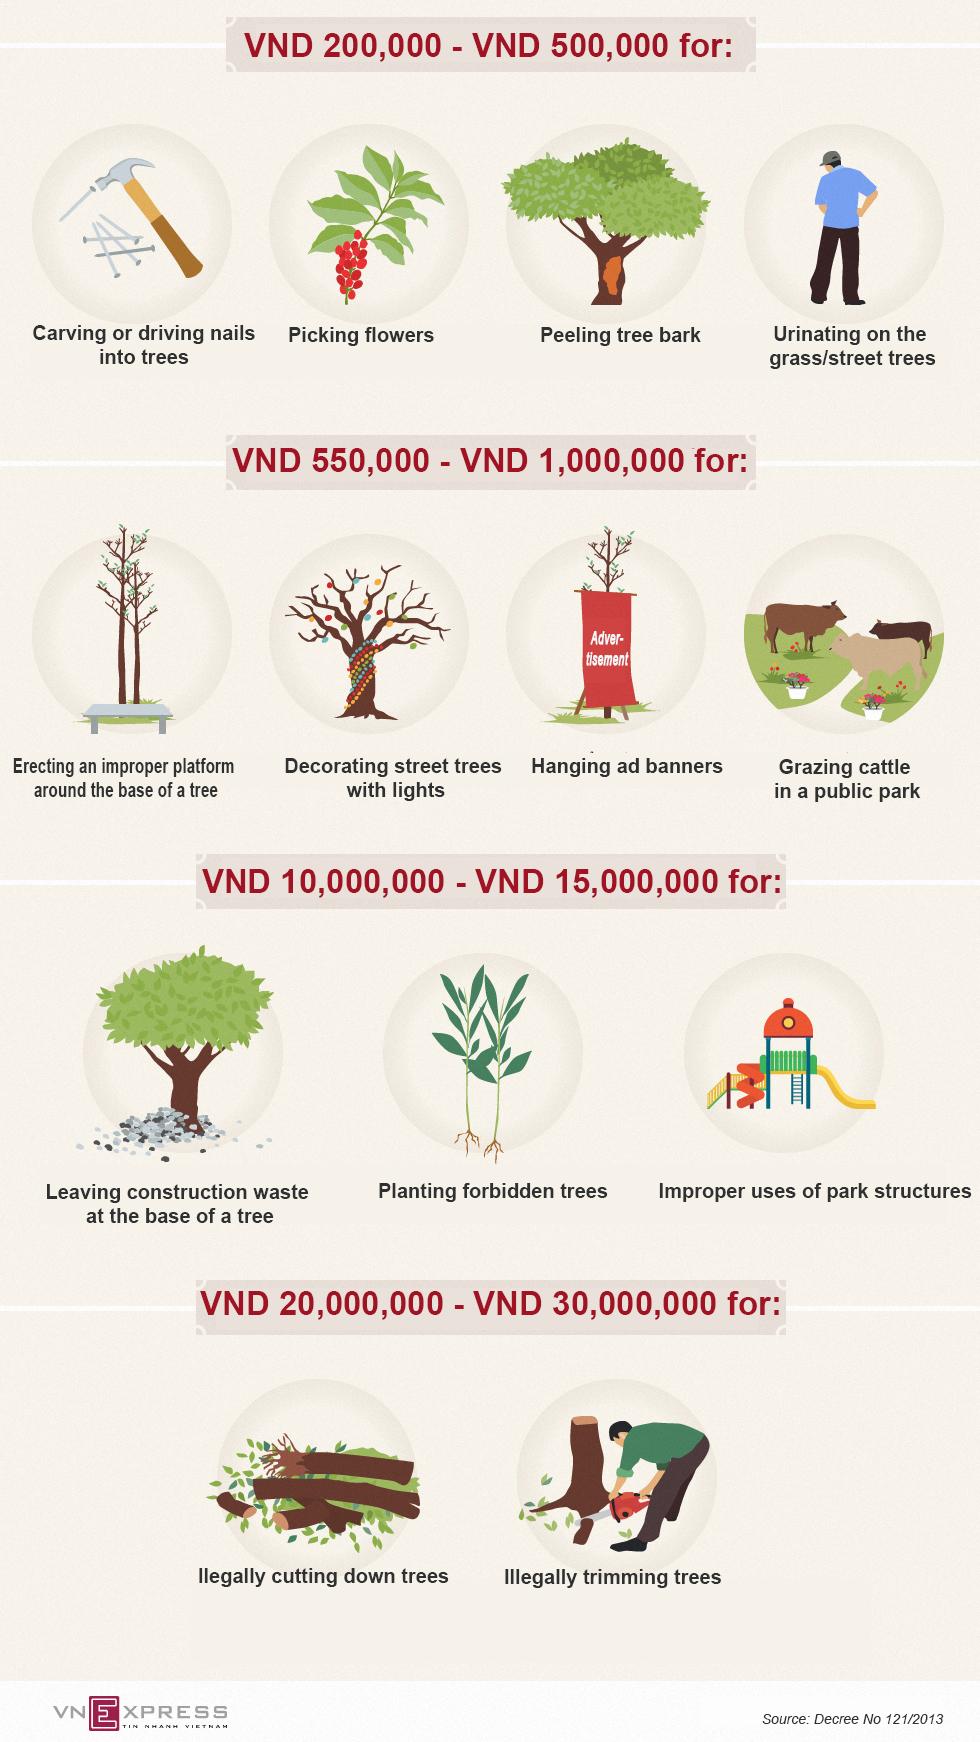 Vietnam rolls out new park fines